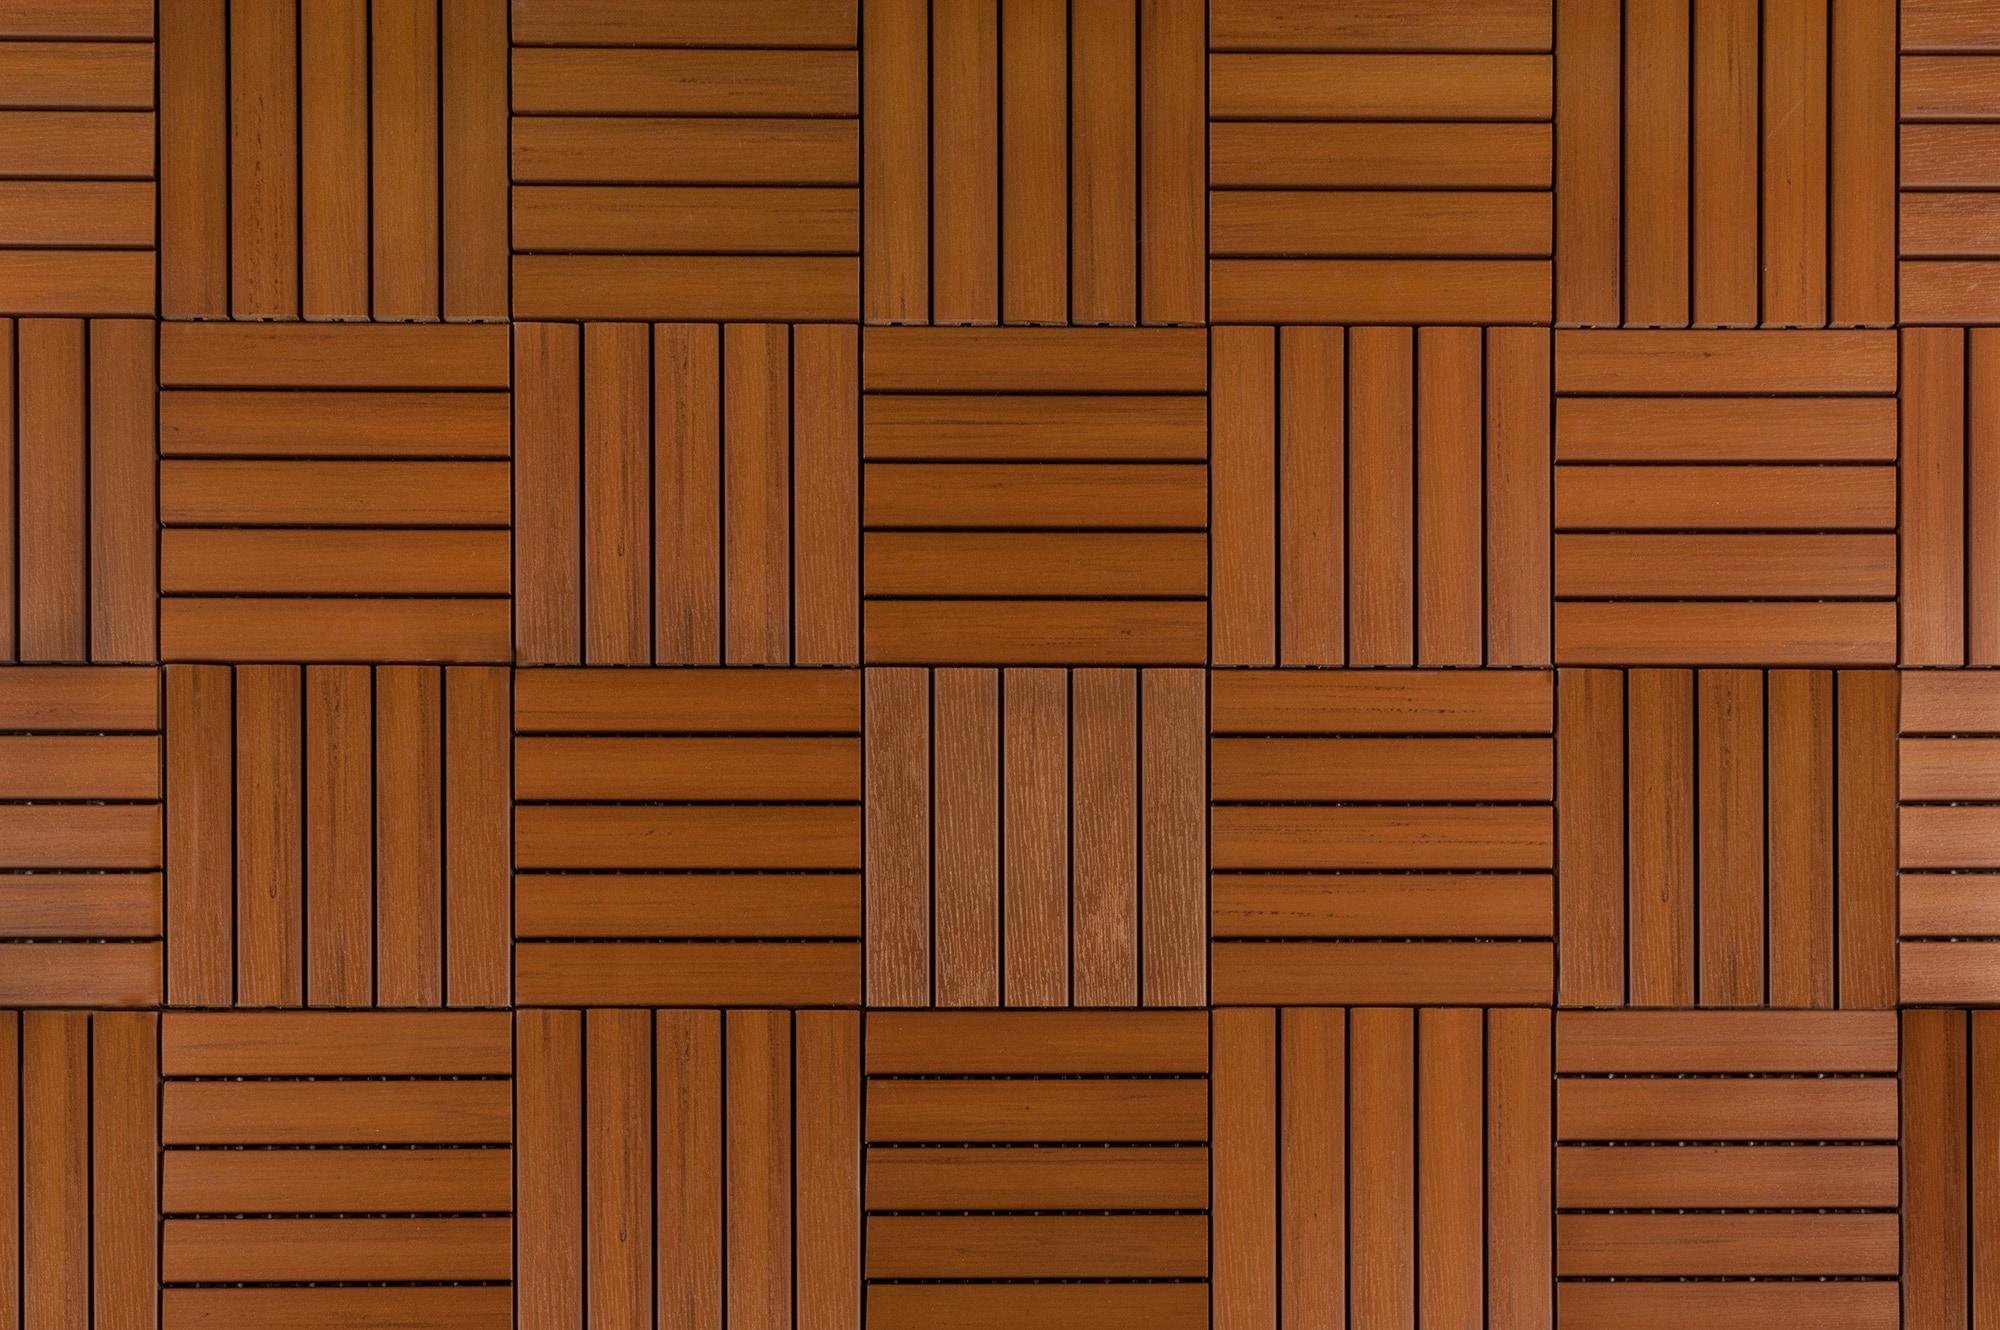 Kontiki interlocking deck tiles engineered polymer series kontiki interlocking deck tiles engineered polymer series premium resin deck tile cedar 12x12x1 dailygadgetfo Gallery